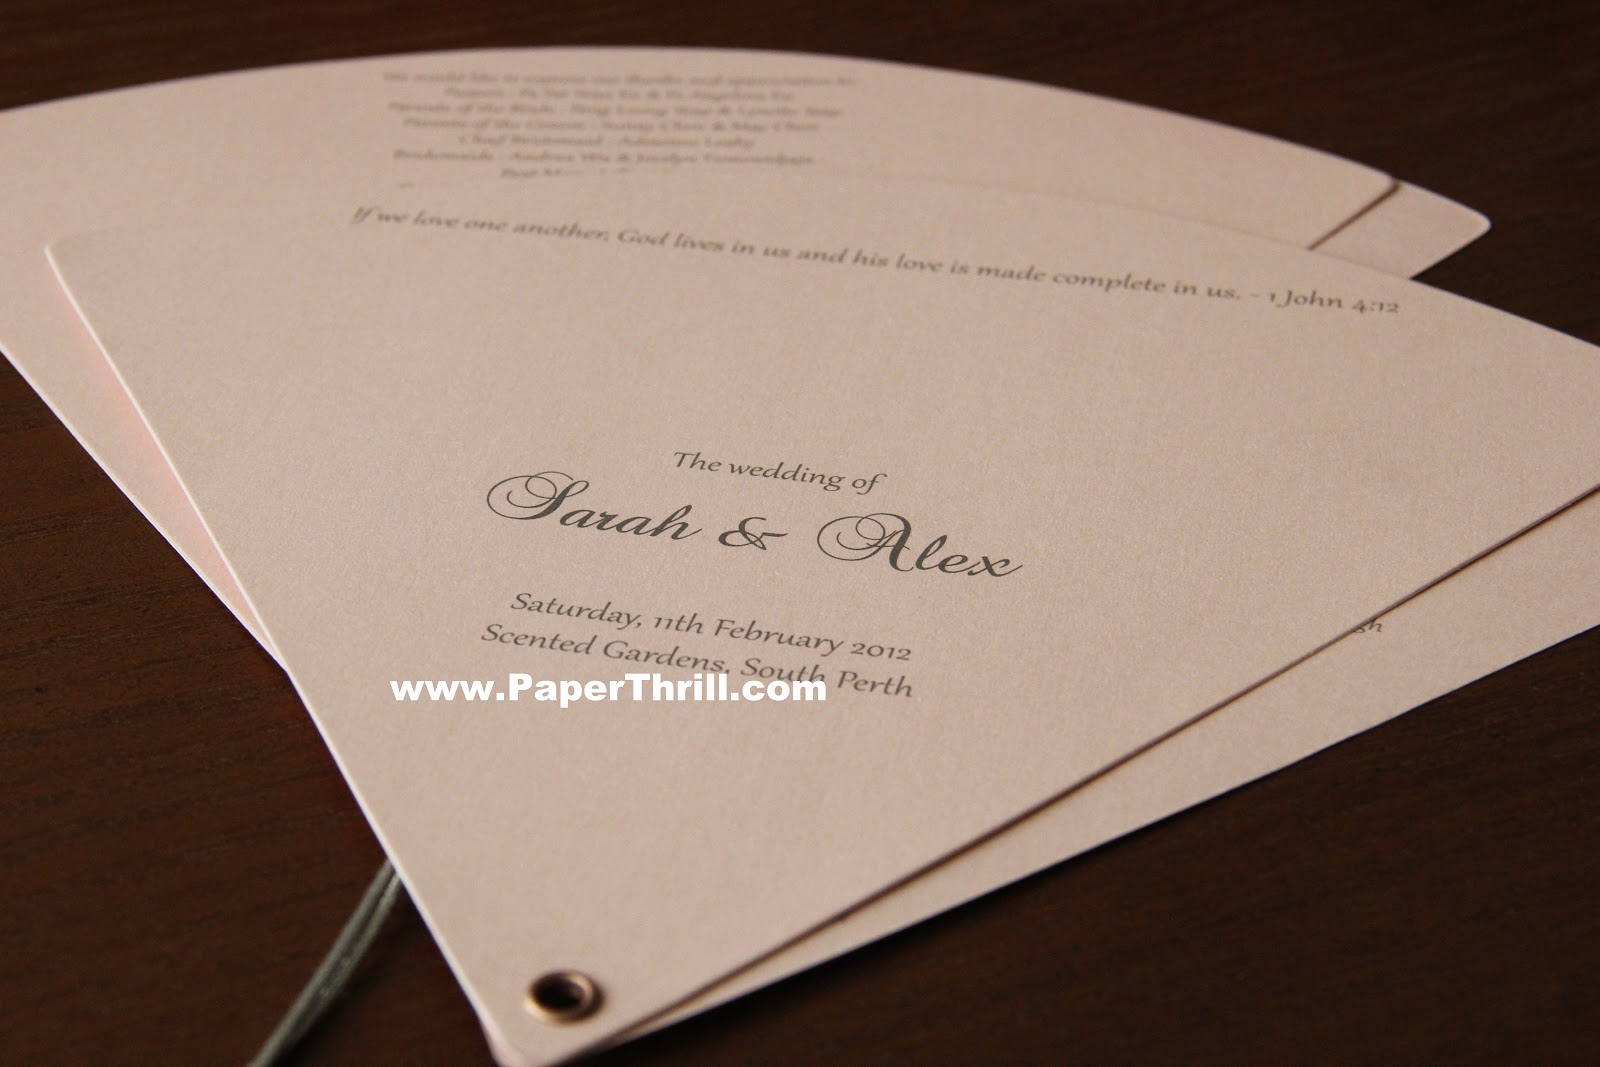 sarah s church program malaysia wedding invitations greeting